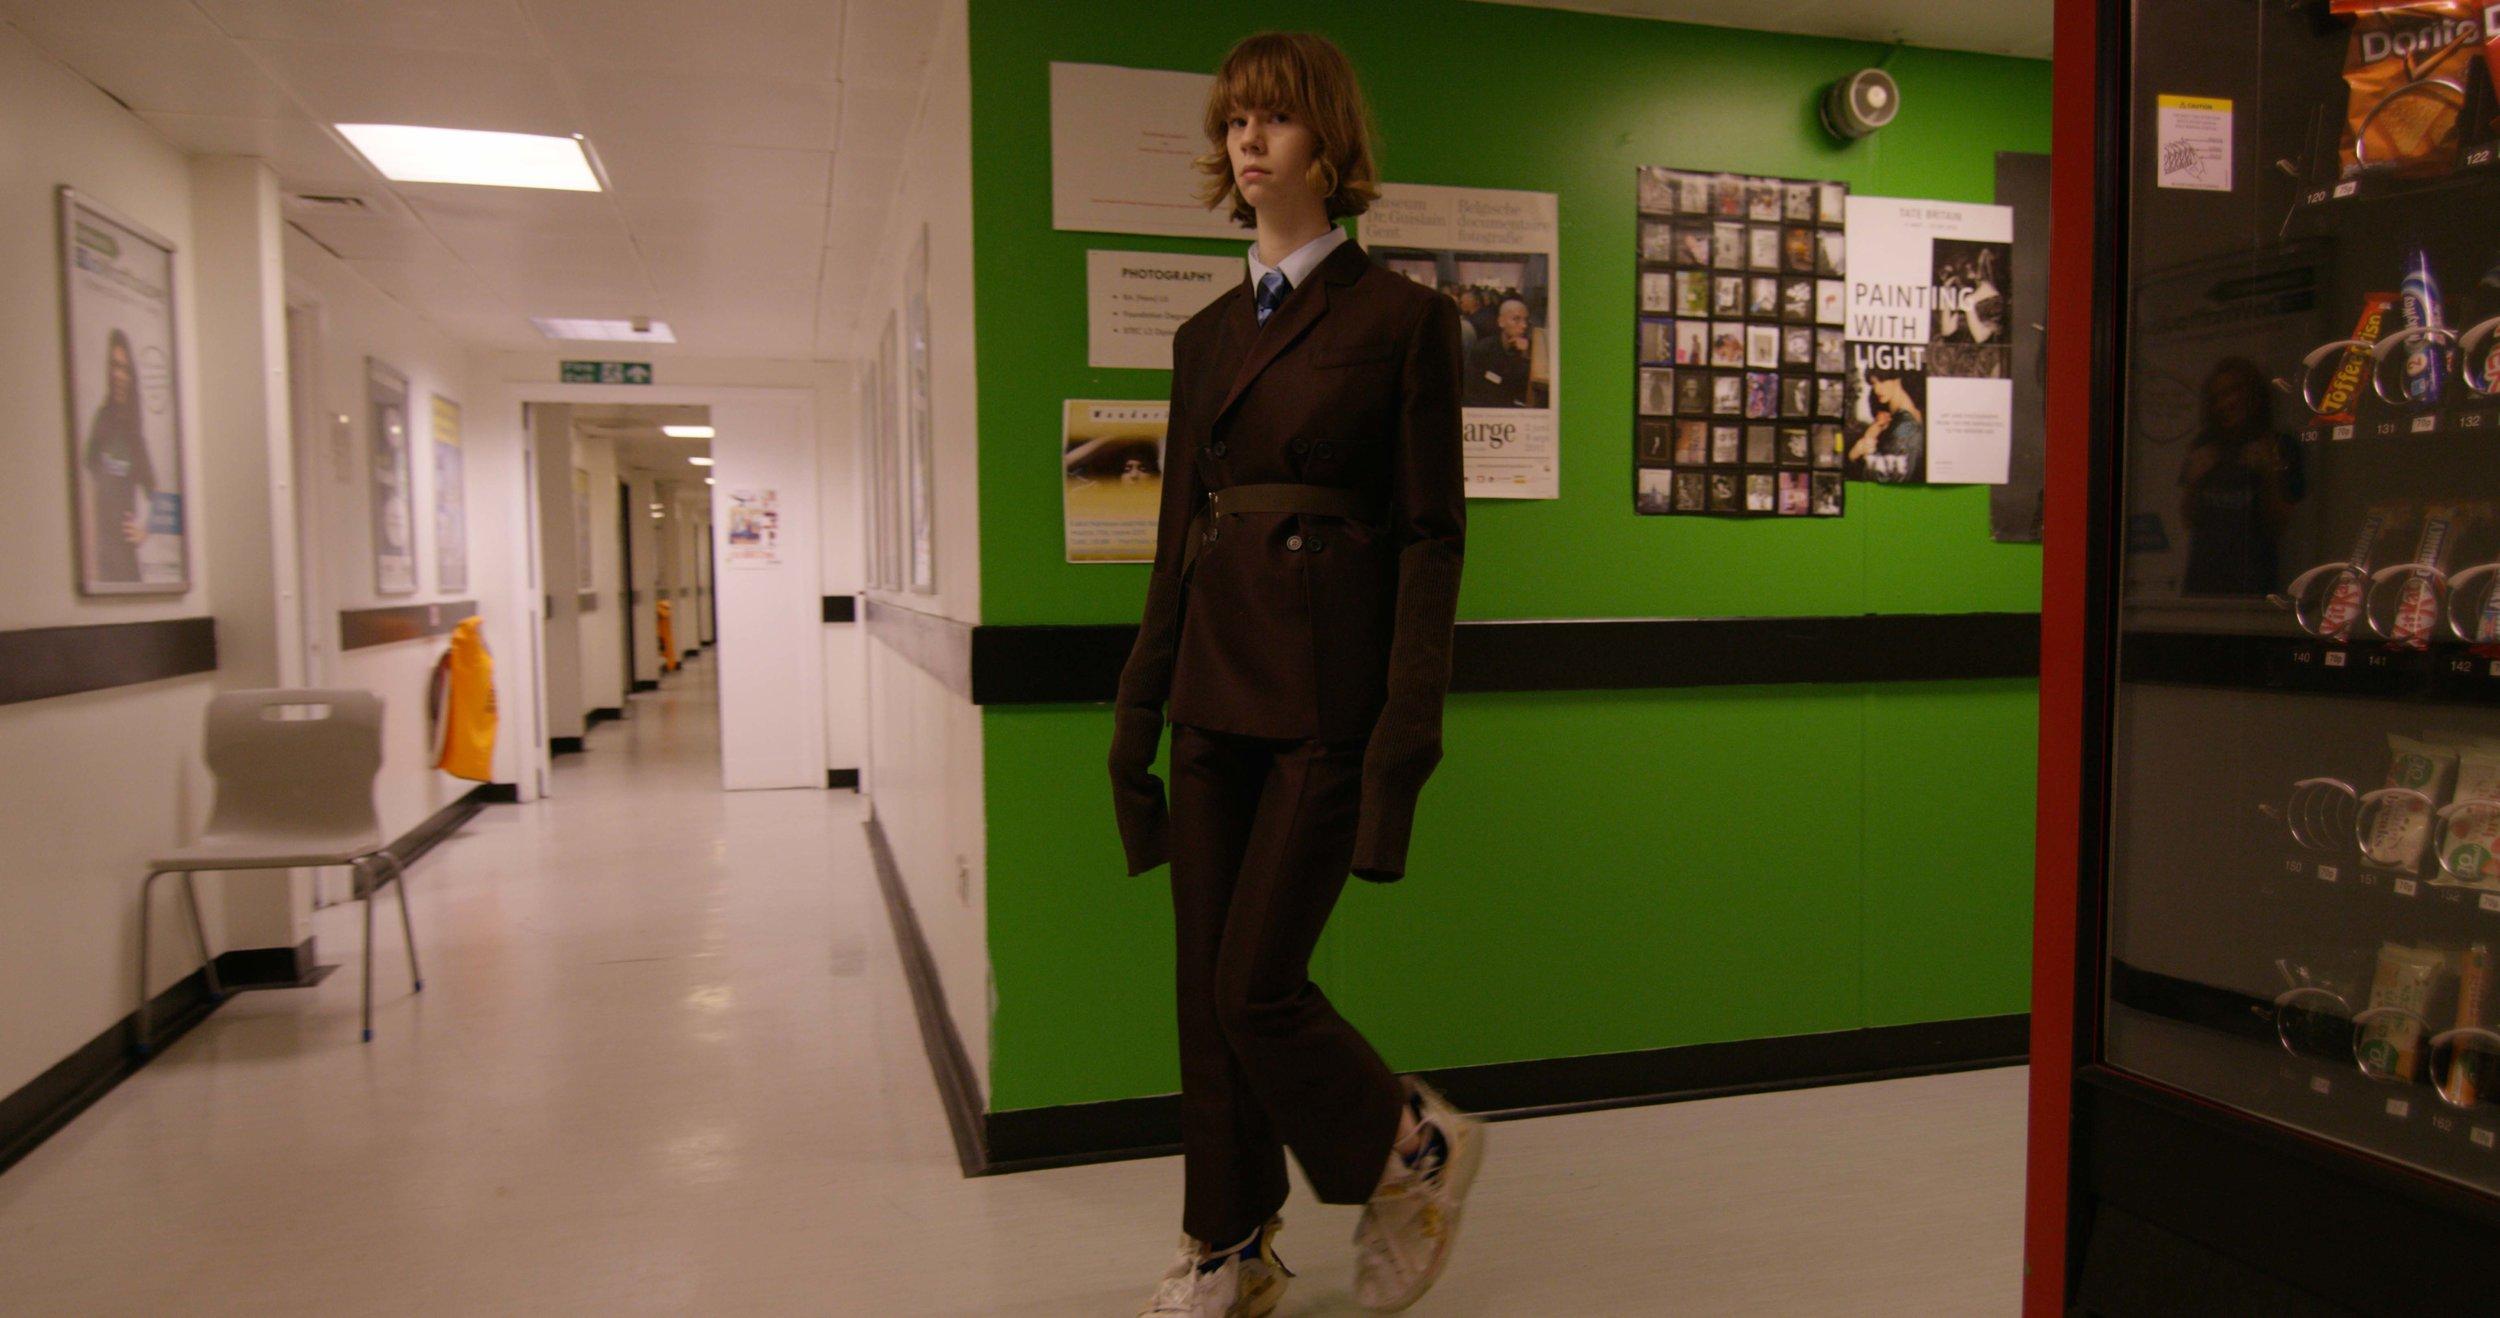 rokh_aw17_fashion_collection_magazine_15.jpg